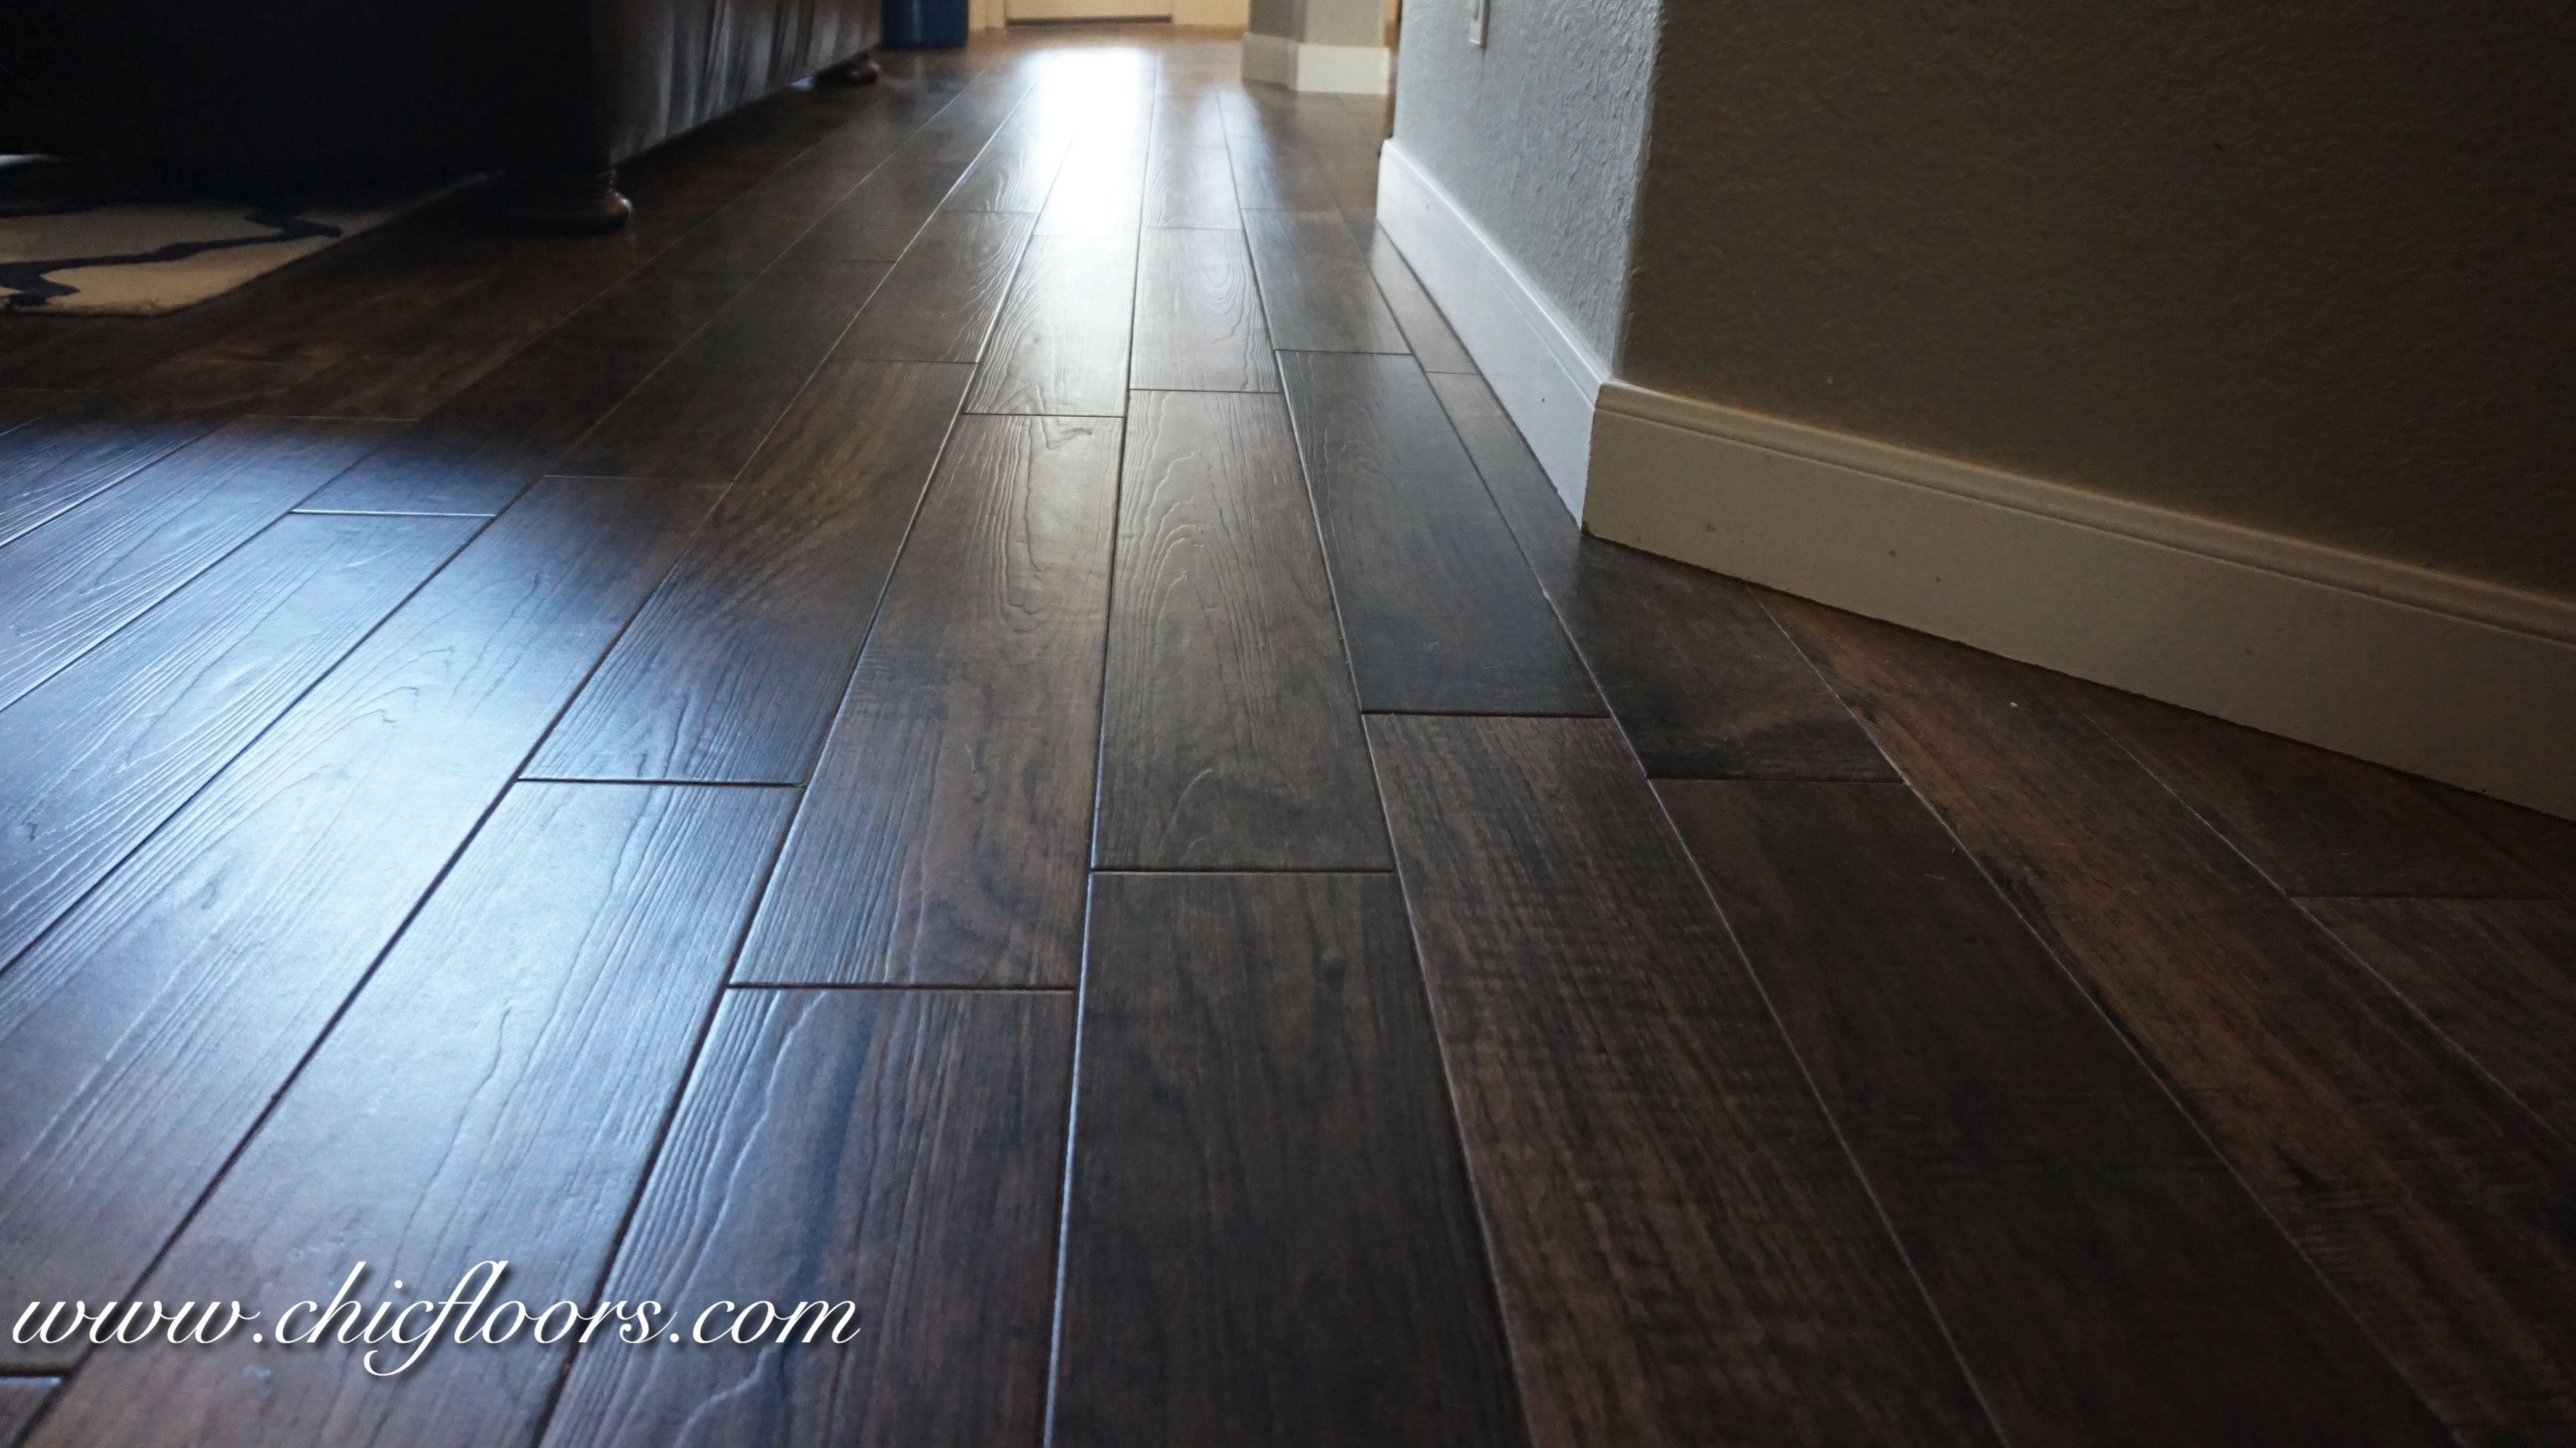 black walnut hardwood flooring for sale of beautiful wood look tile by shaw hacienda color walnut our work in beautiful wood look tile by shaw hacienda color walnut wood look tile flooring ideas